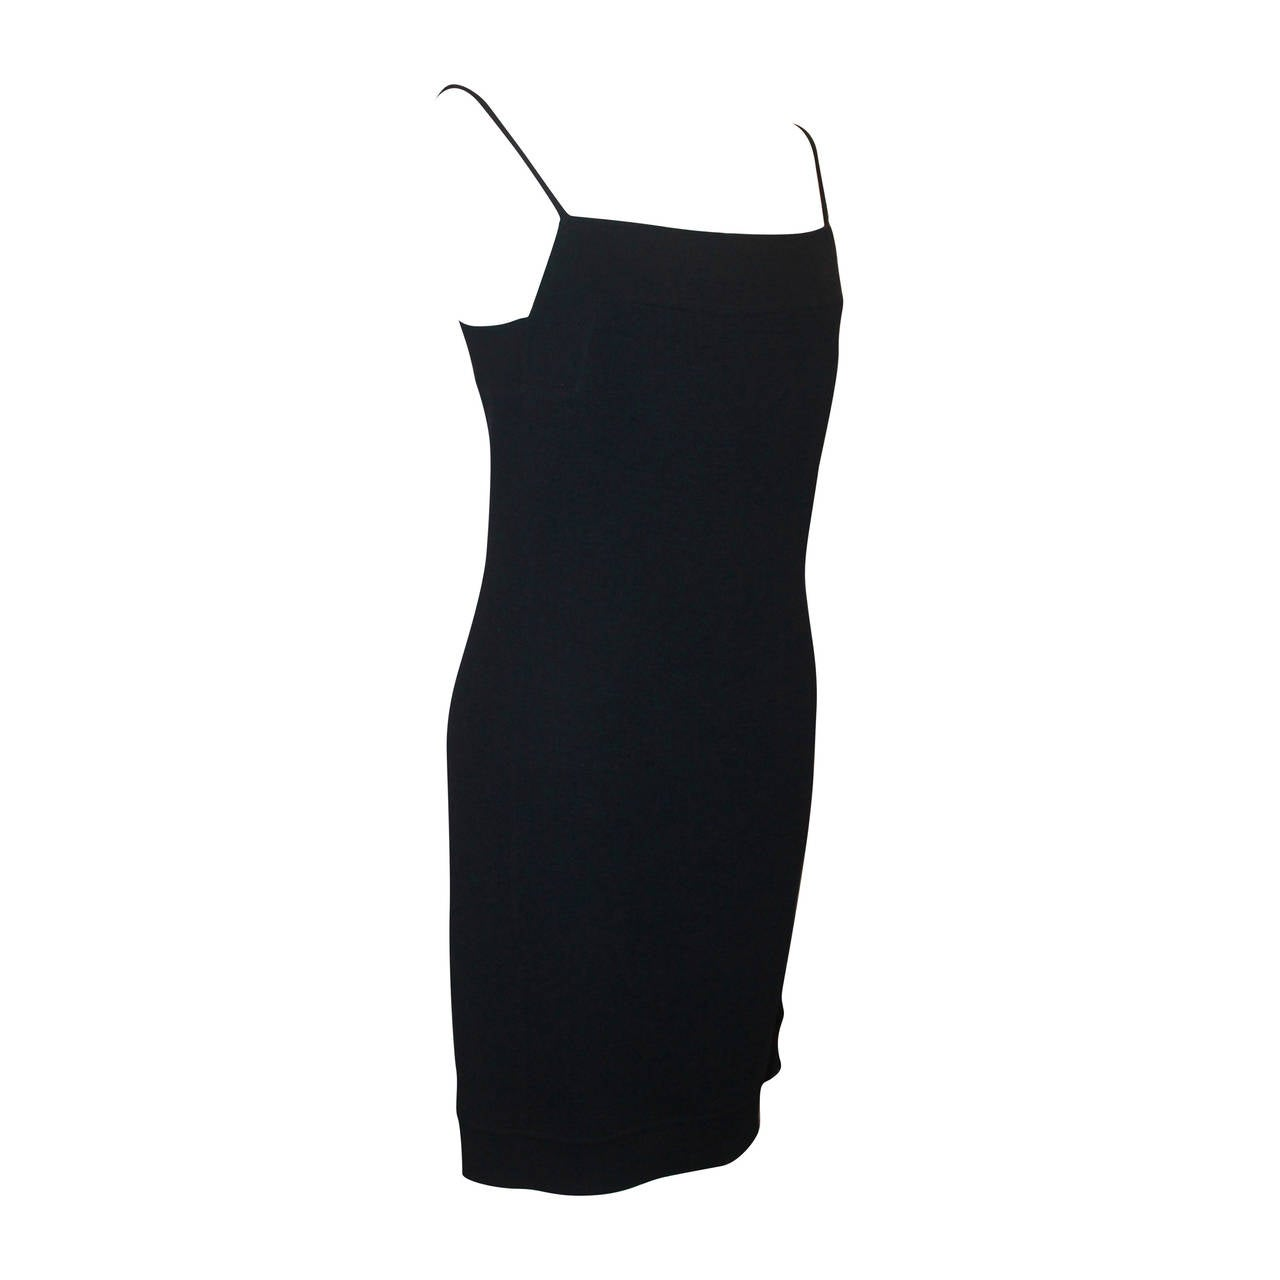 Chado Navy Wool Dress - 10